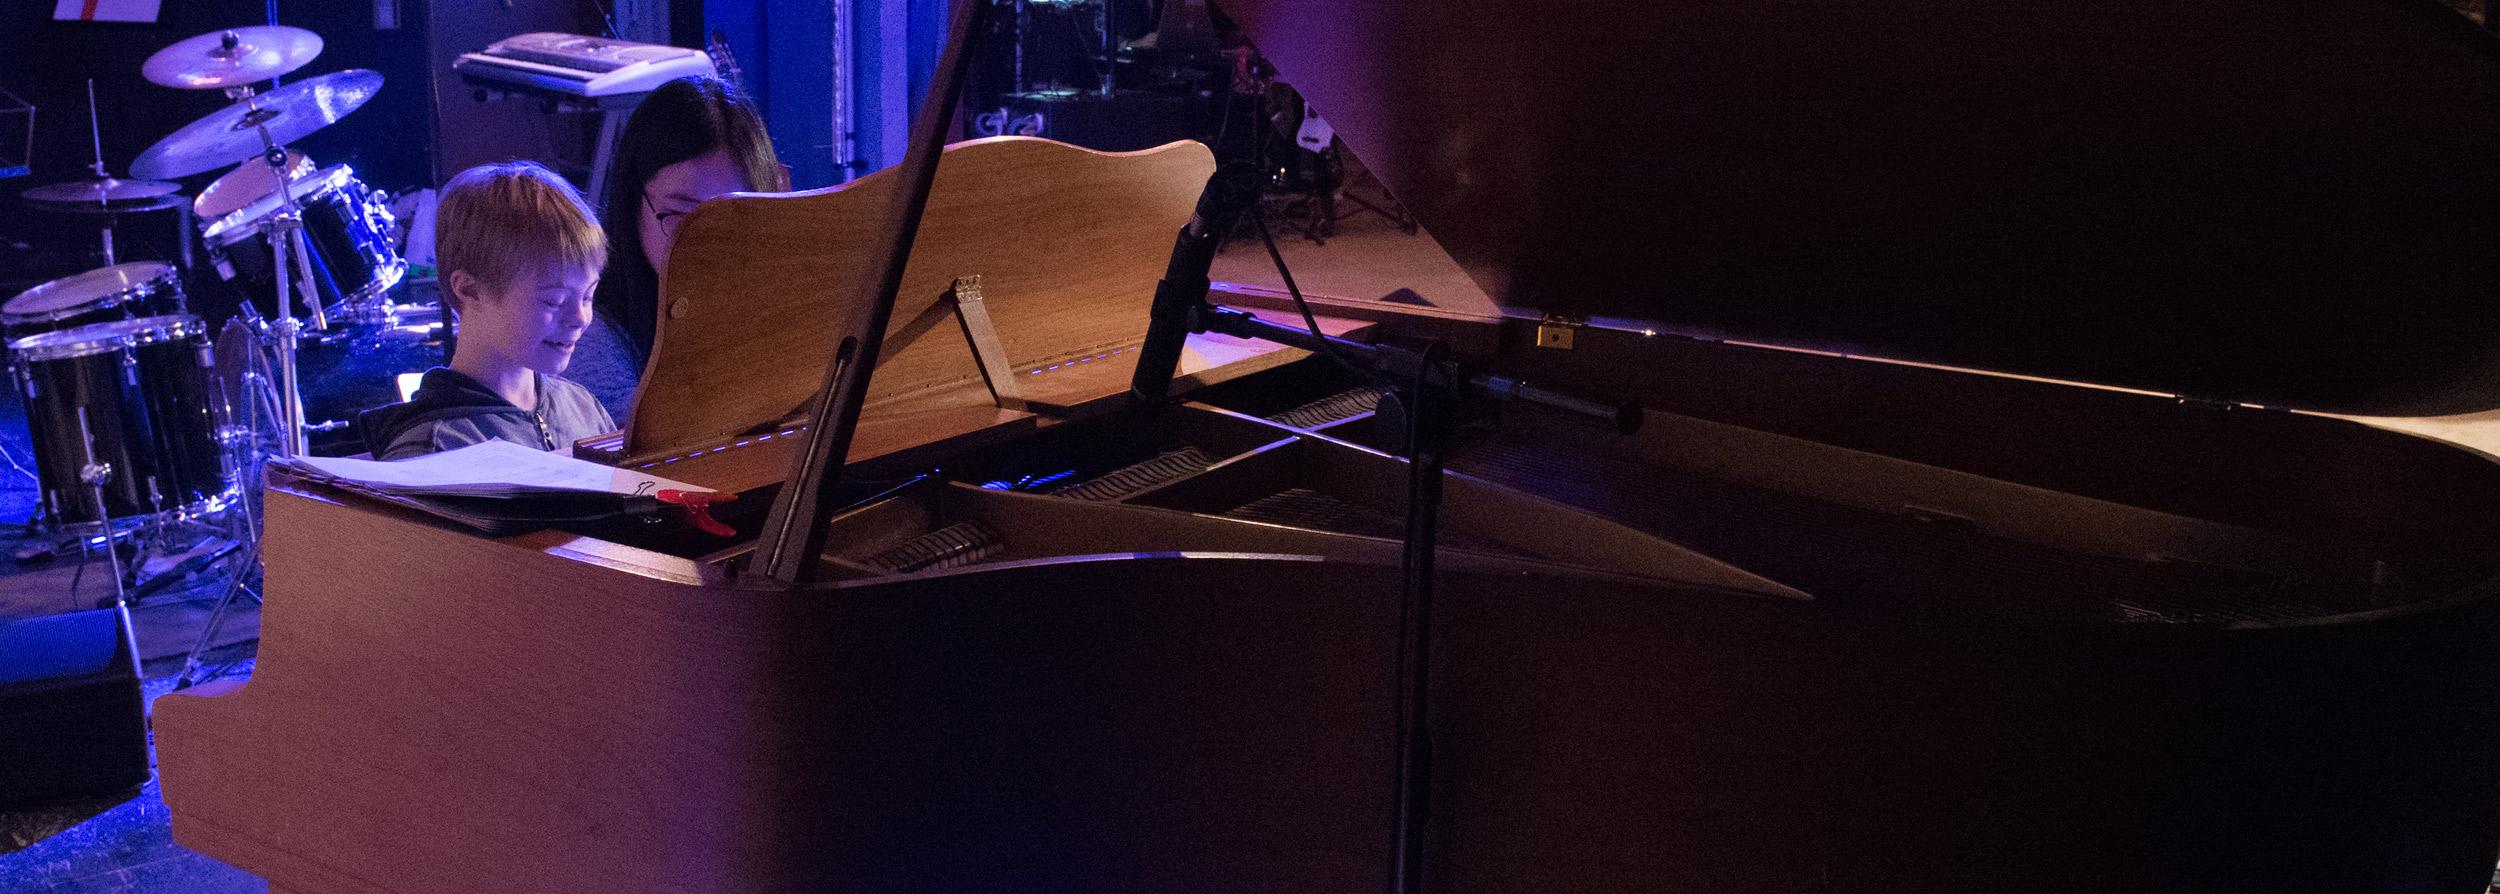 Musiktherapie bei Musicus e.V.